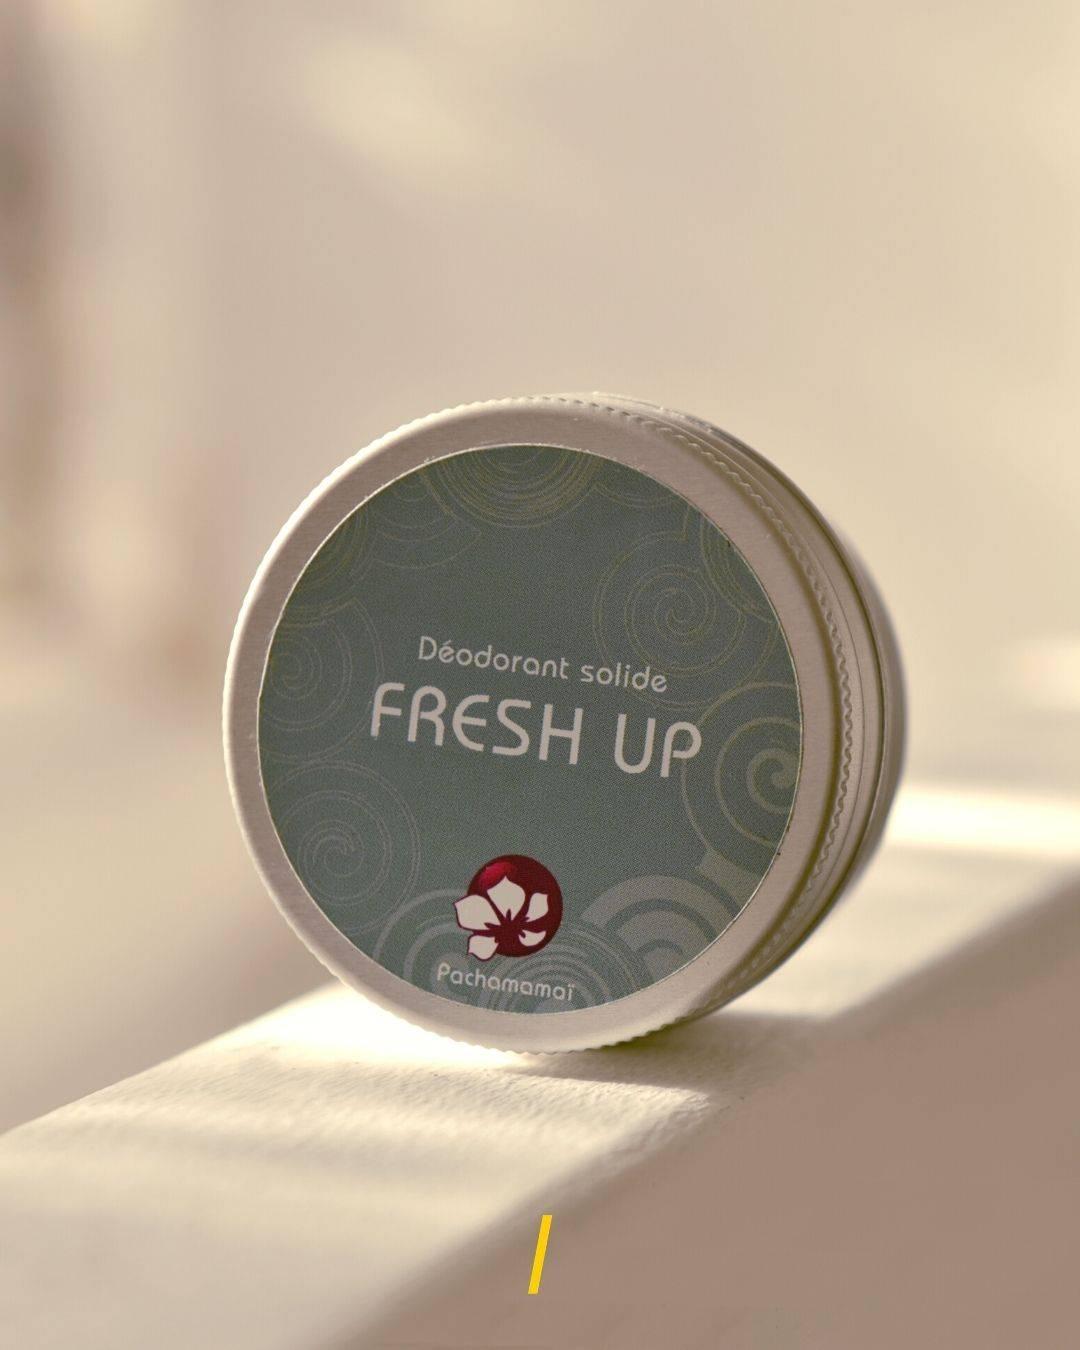 Le deodorant solide Fresh'up - Pachamamai